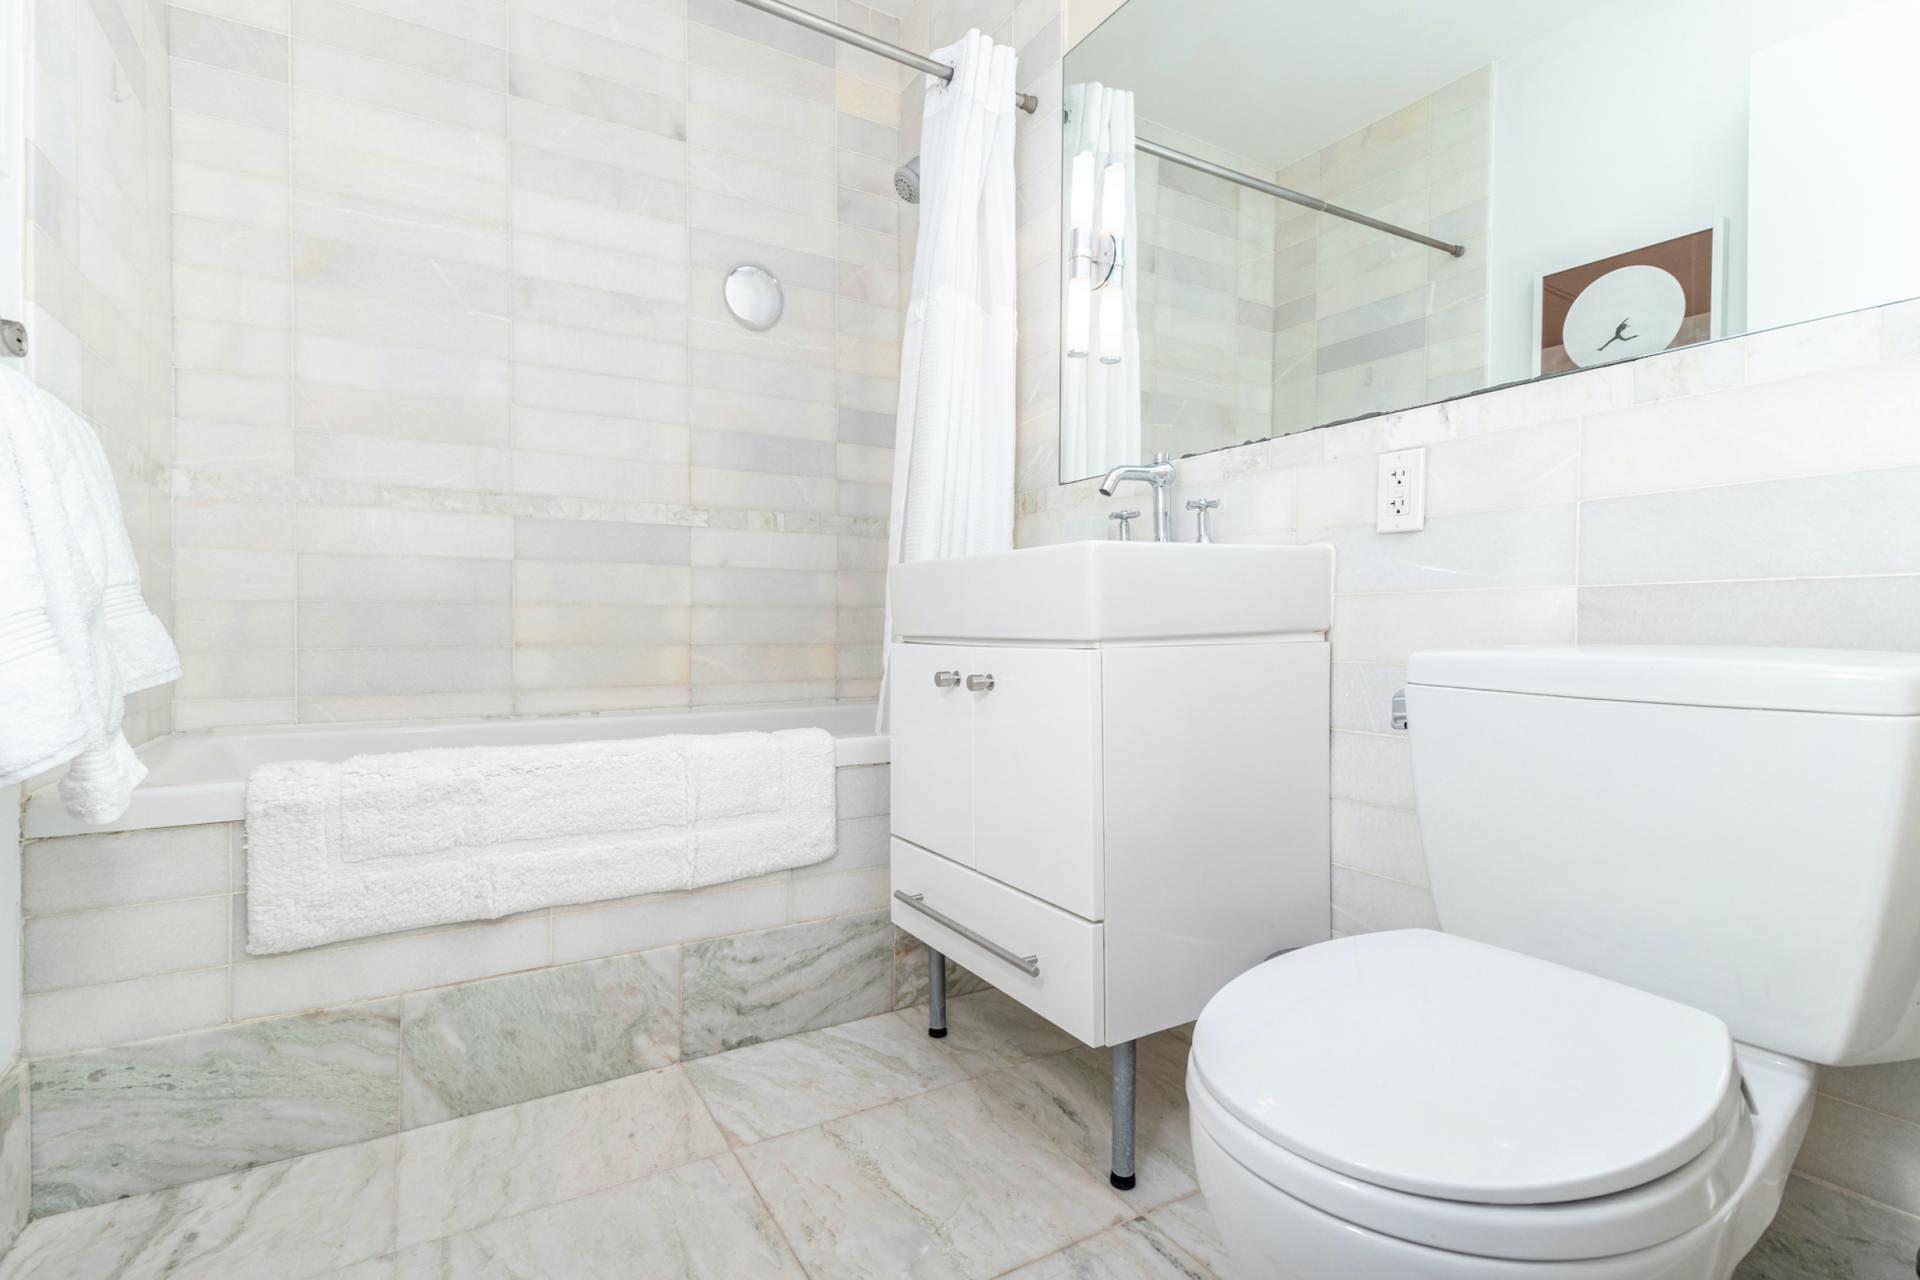 Bathroom at Apartments at Alexan 100, Belltown, Seattle